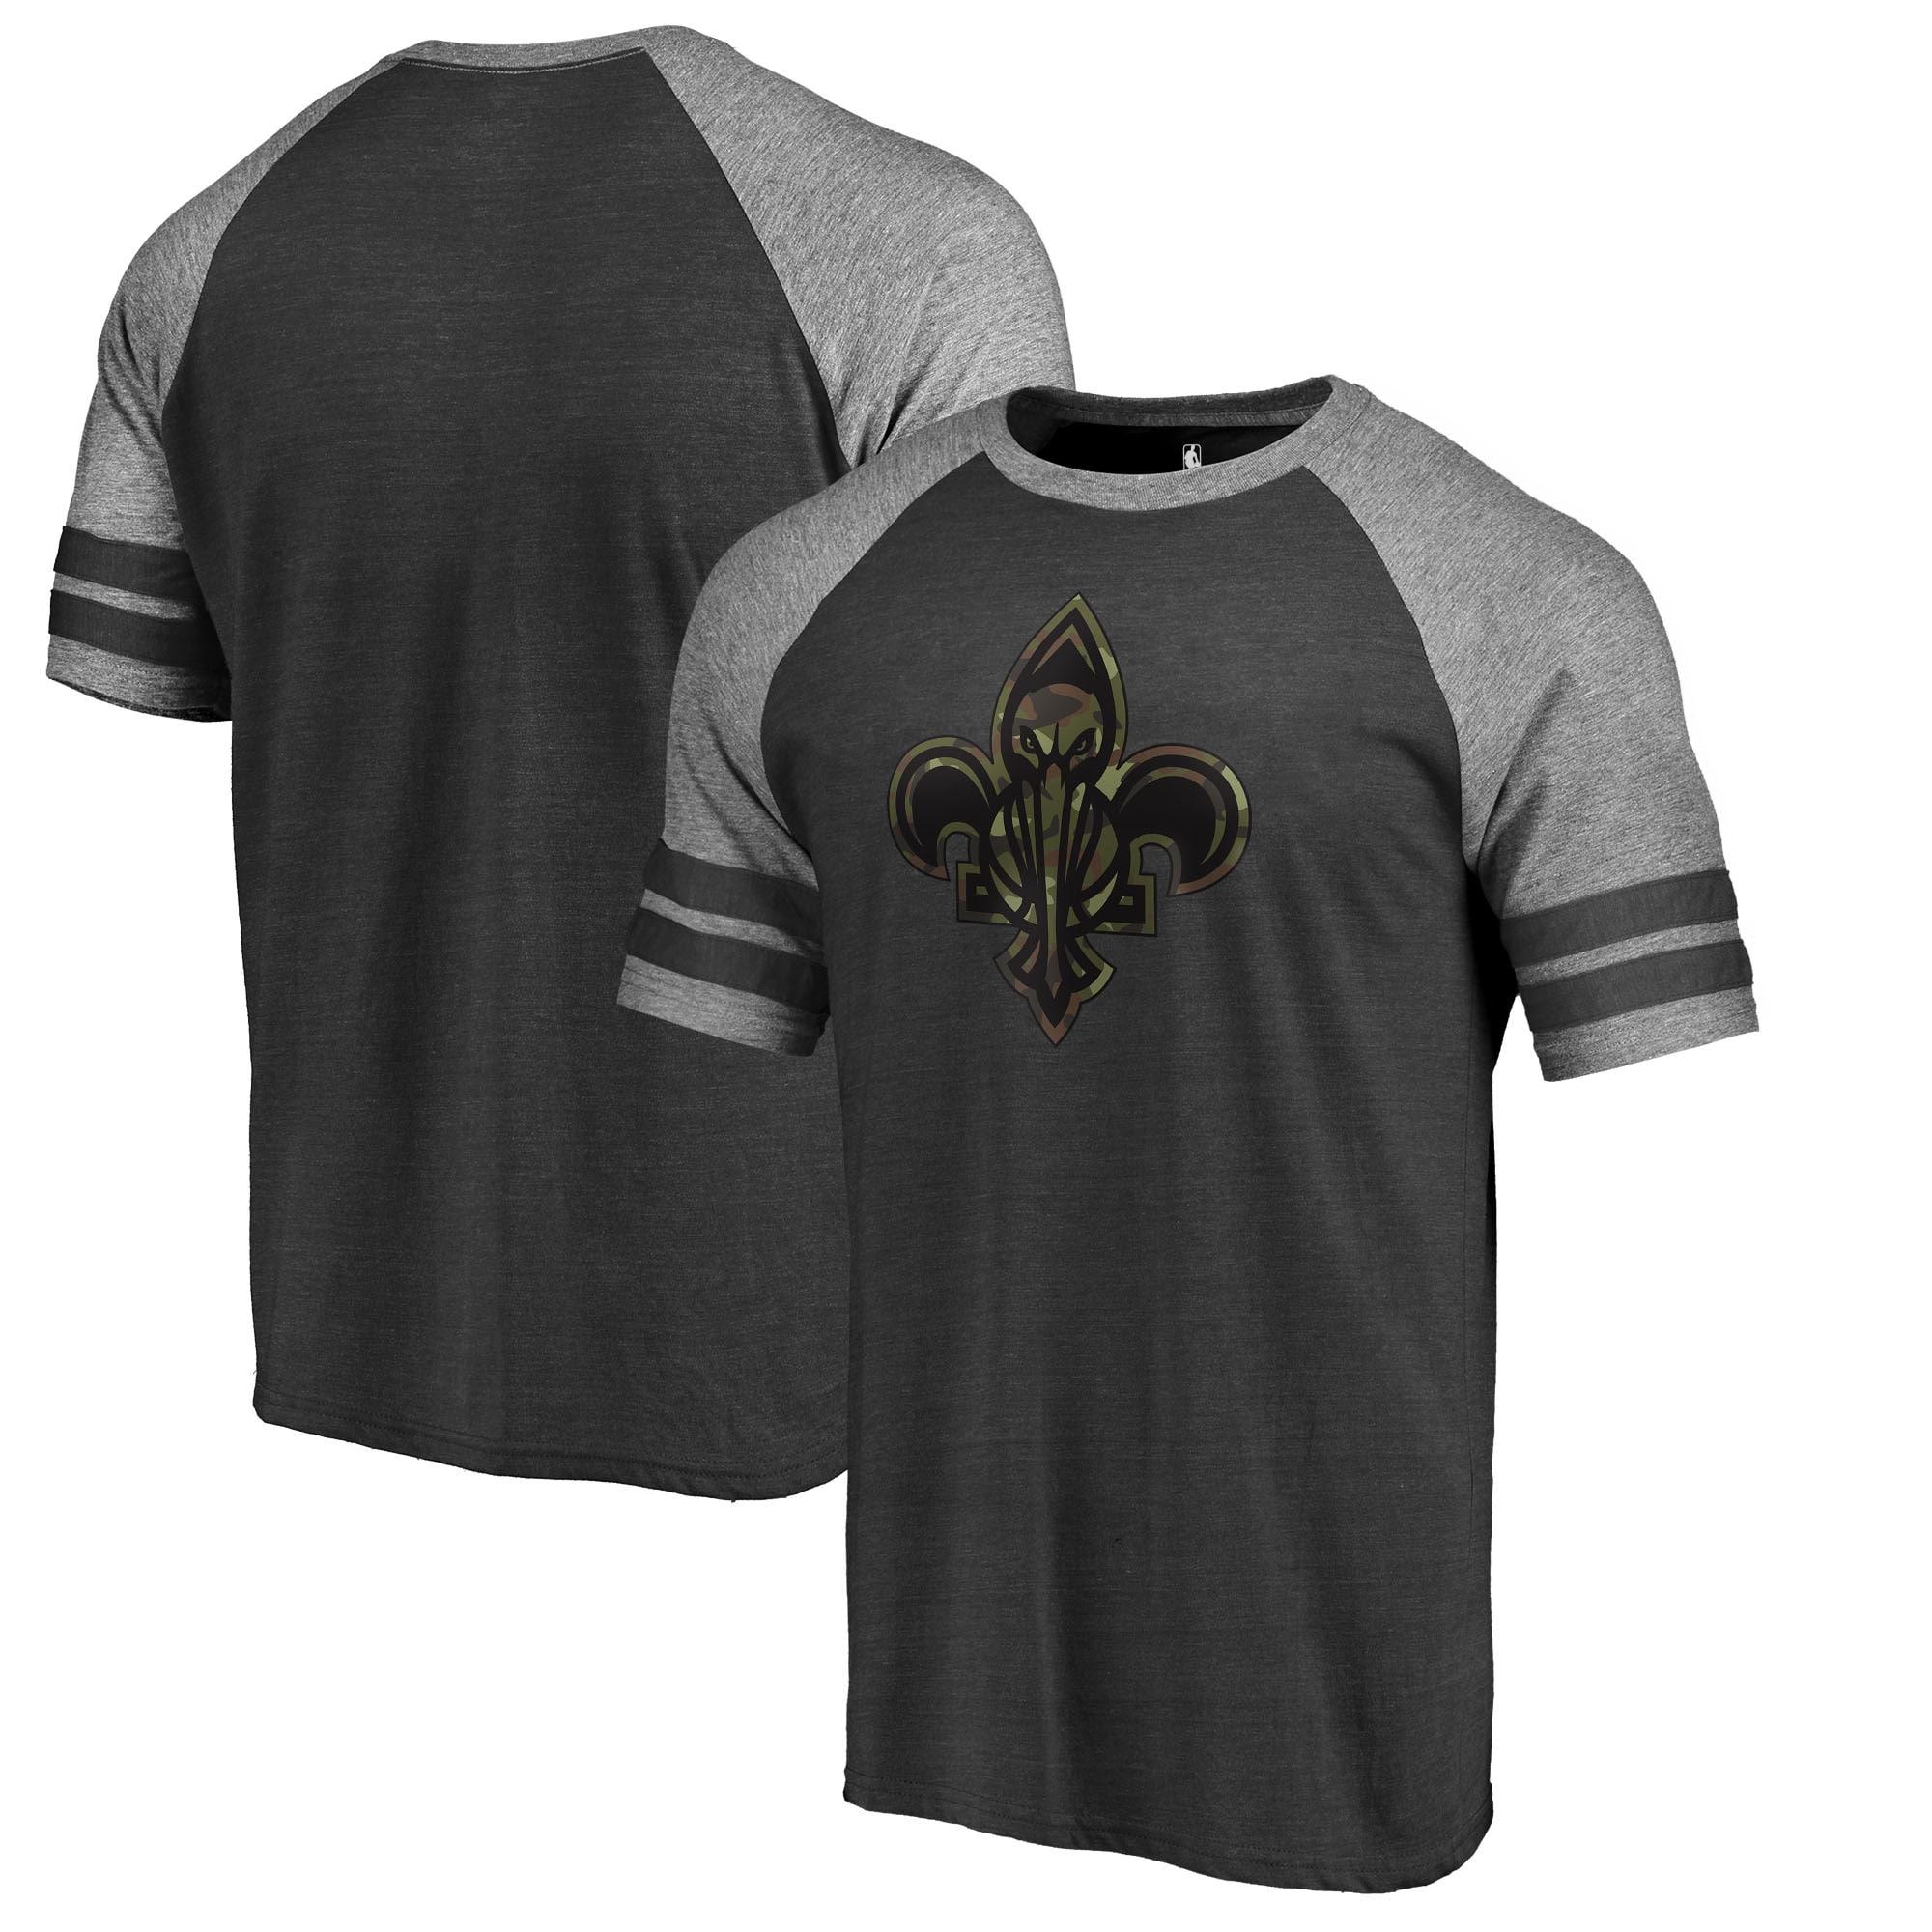 New Orleans Pelicans Fanatics Branded Prestige Camo 2-Stripe Raglan T-Shirt - Black